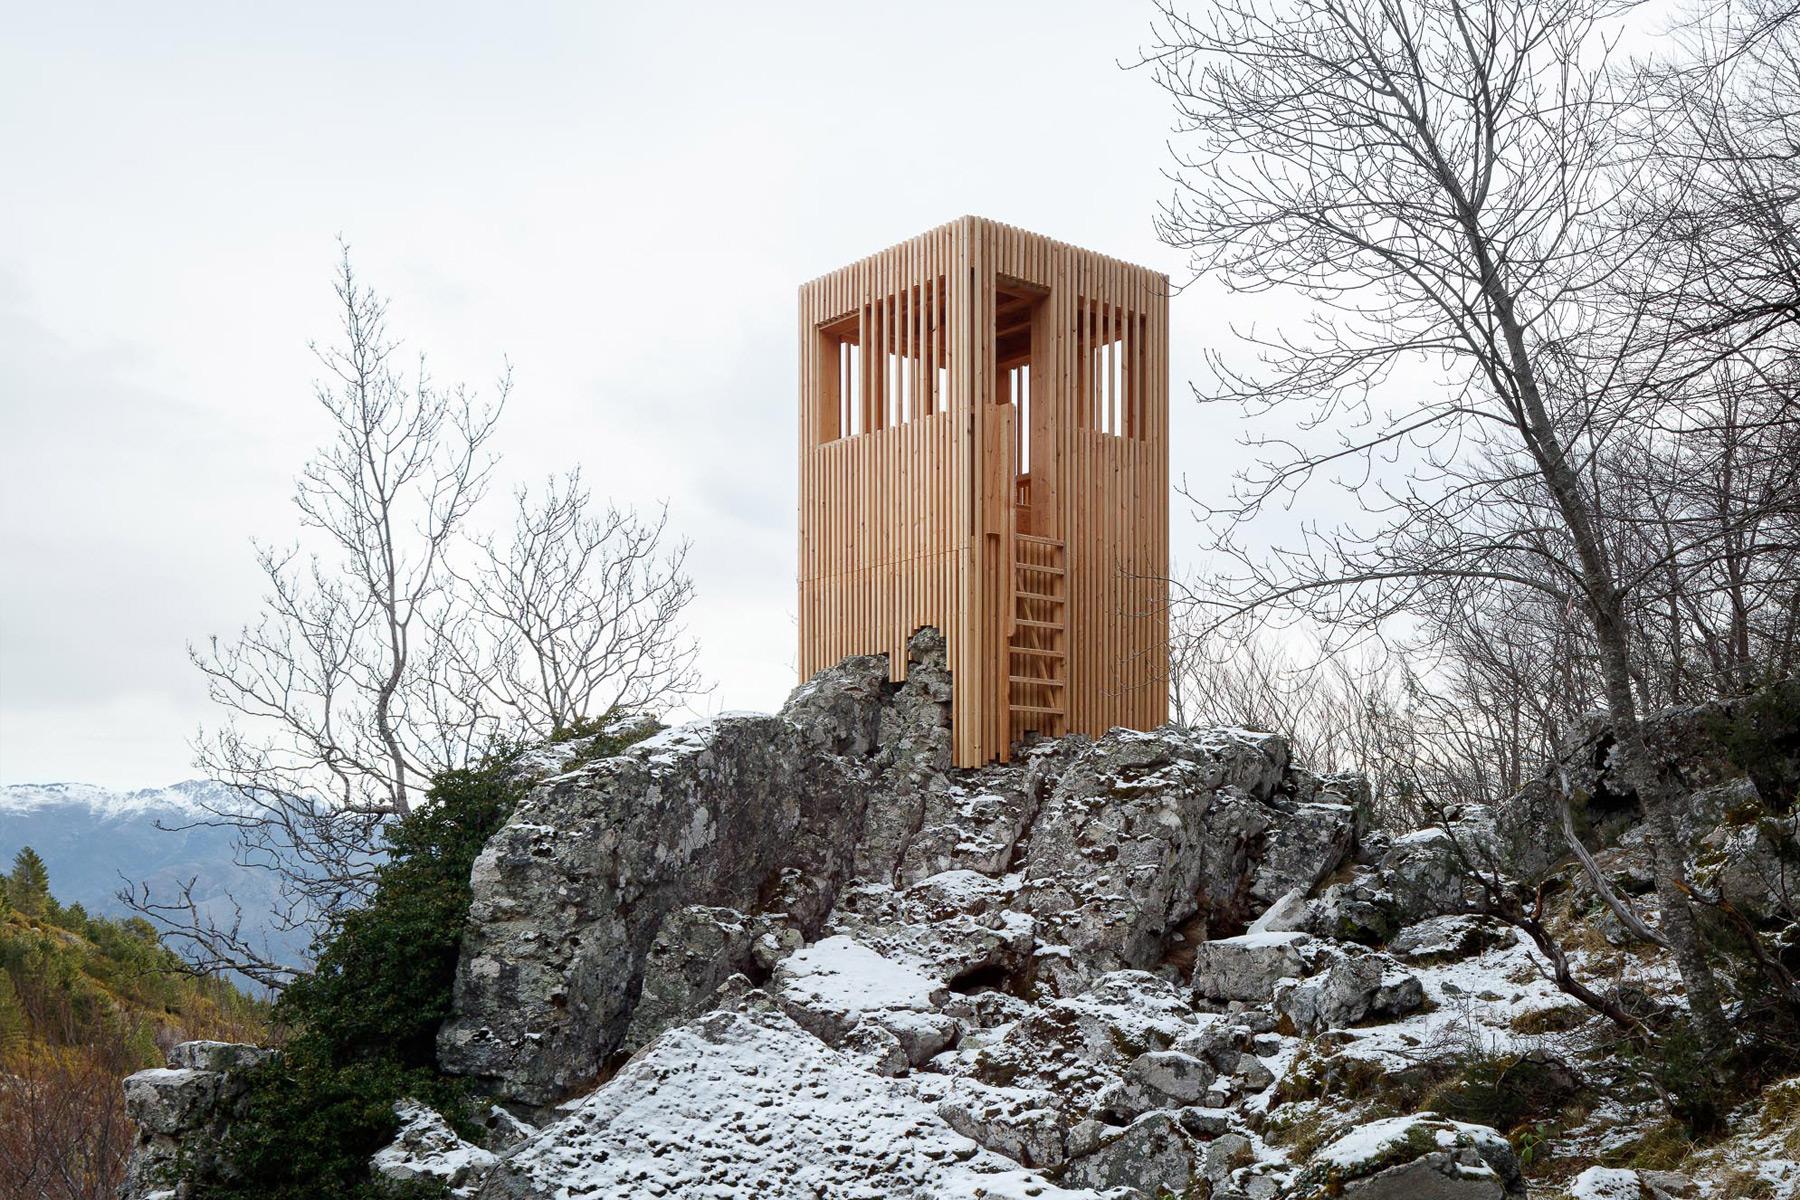 04-Observatoire-du-Cerf-Corse-Orma-Architettura